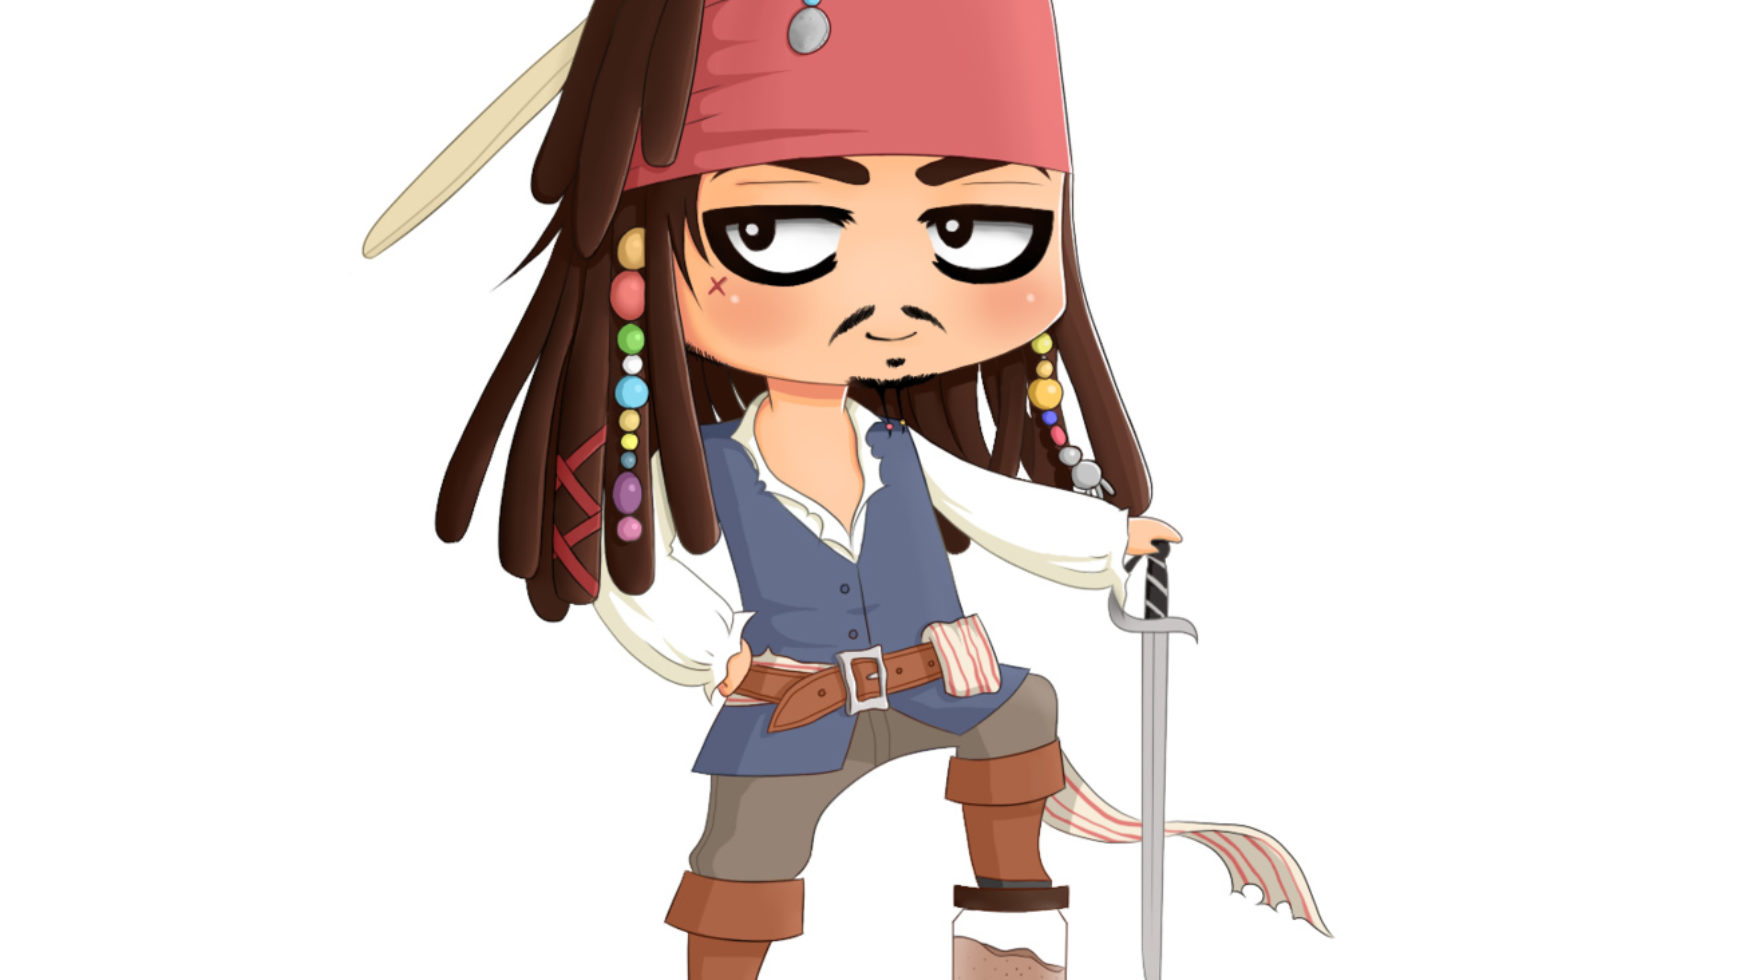 Джек воробей и пиратка